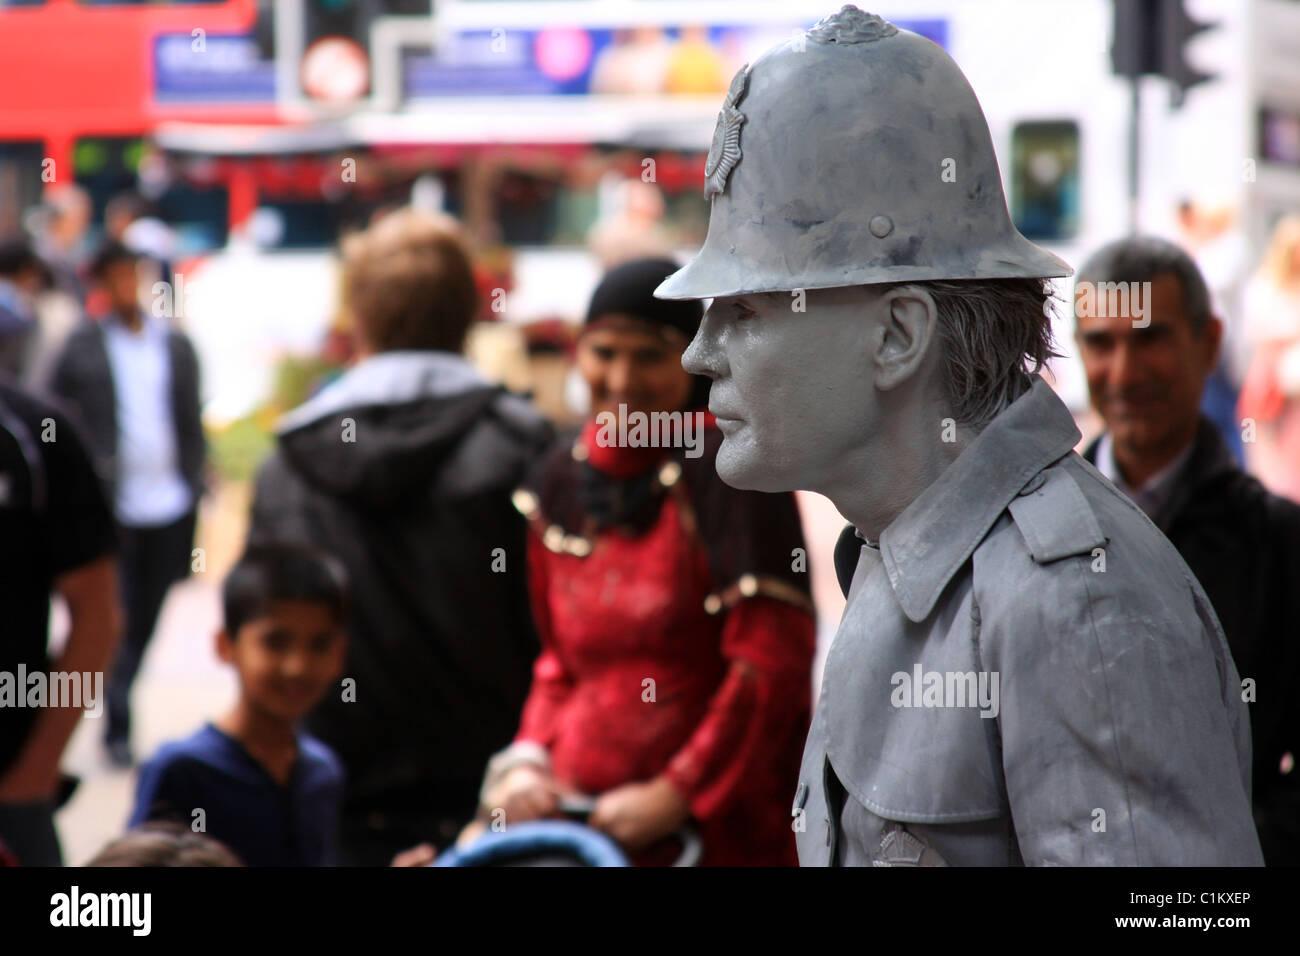 Street entertainer dressed as policeman statue in Birmingham UK - Stock Image